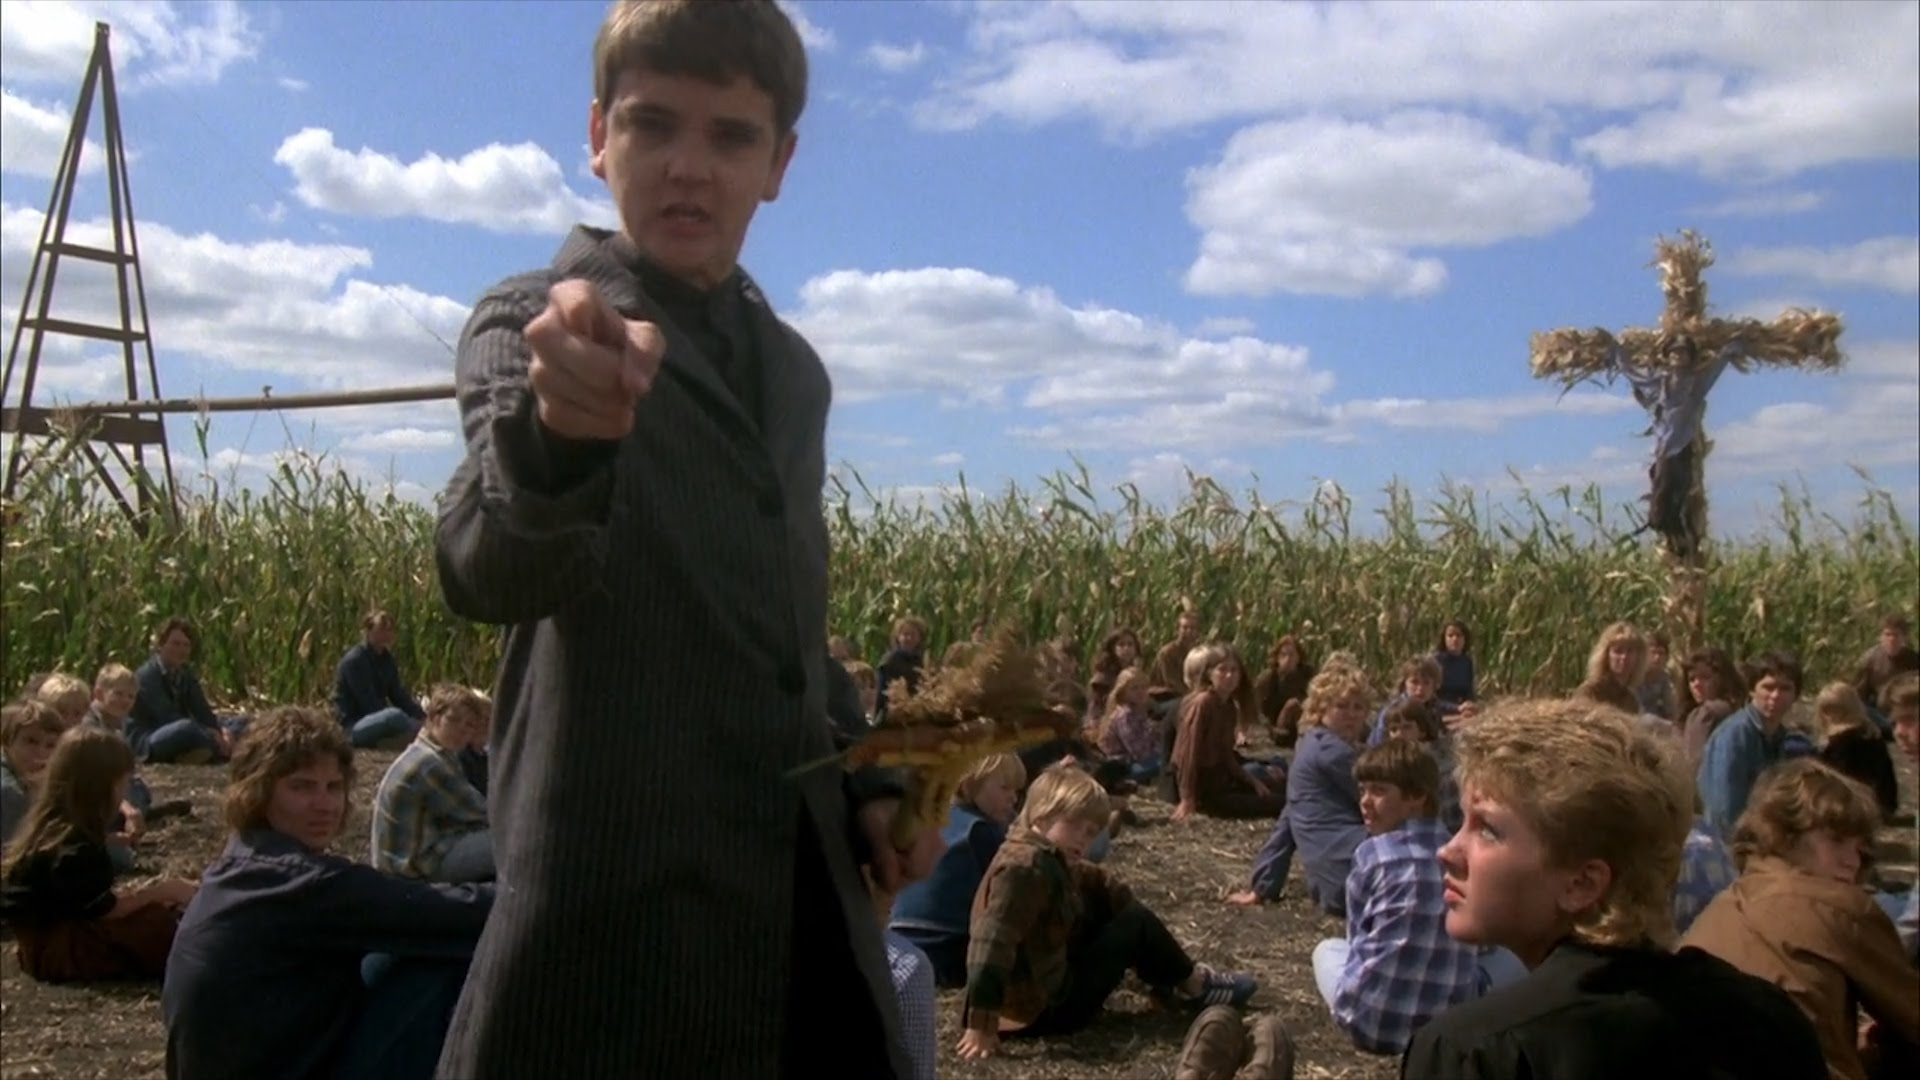 Children of the Corn': Press Release Confirms 'Runaway'!.